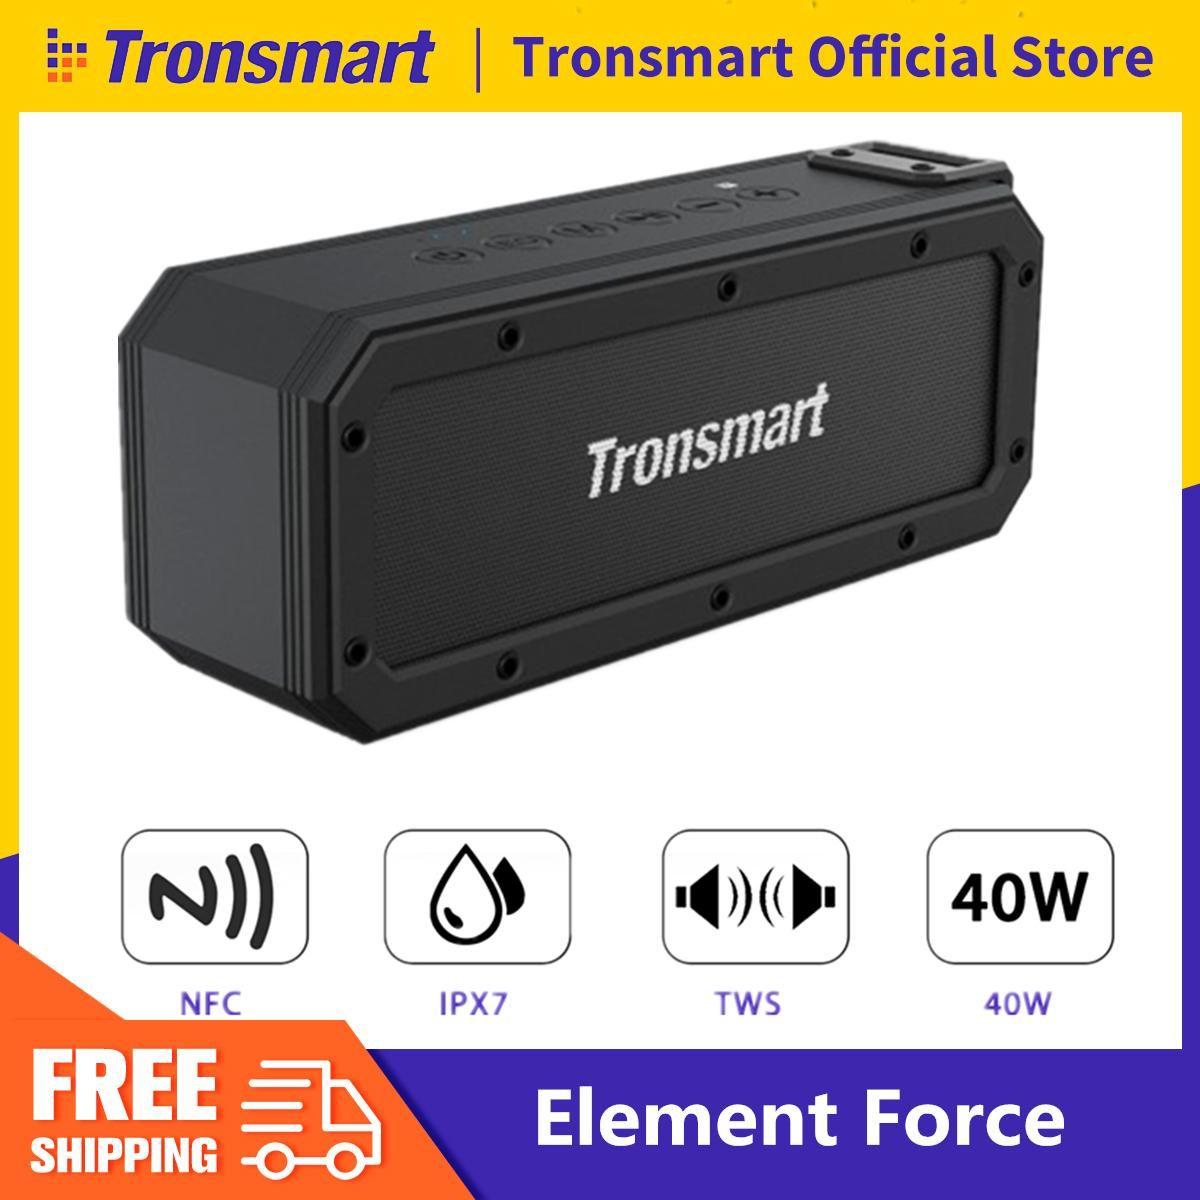 TRONSMART Element Force TWS 40W potencia BT 5.0 NFC Google assistant